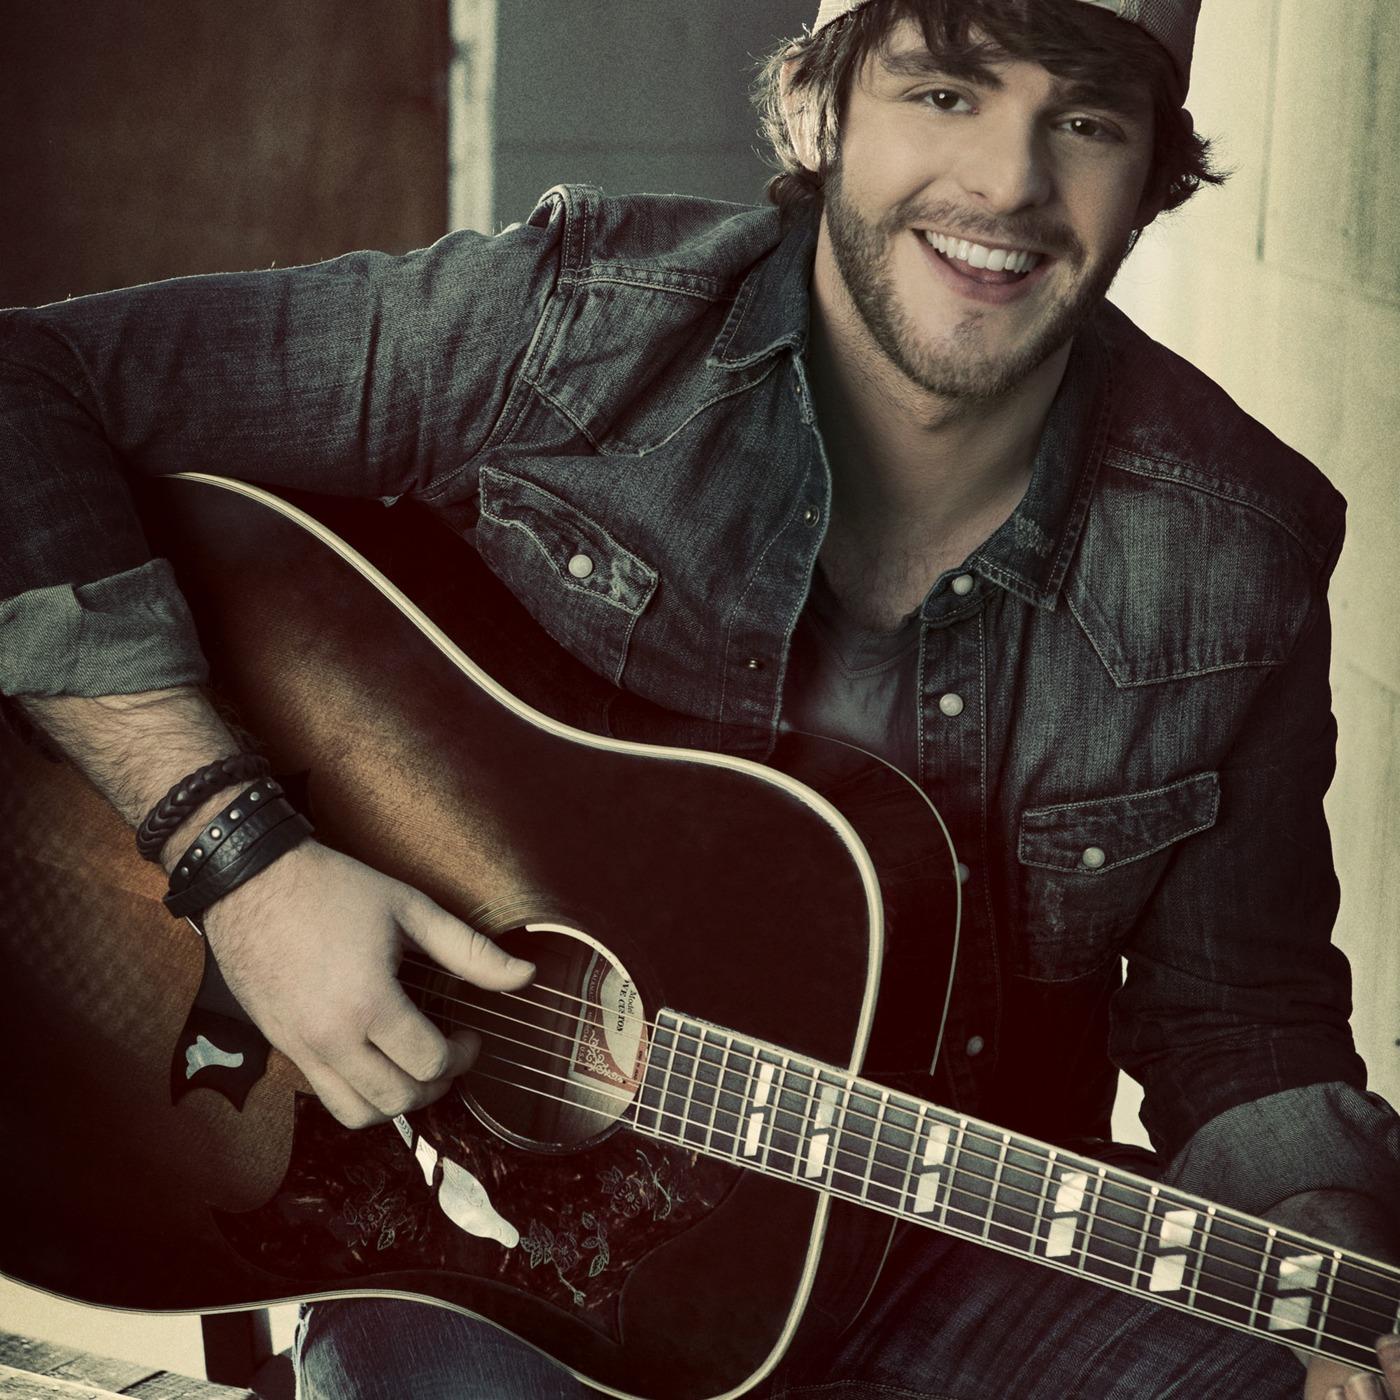 how to play t shirt by thomas rhett on guitar